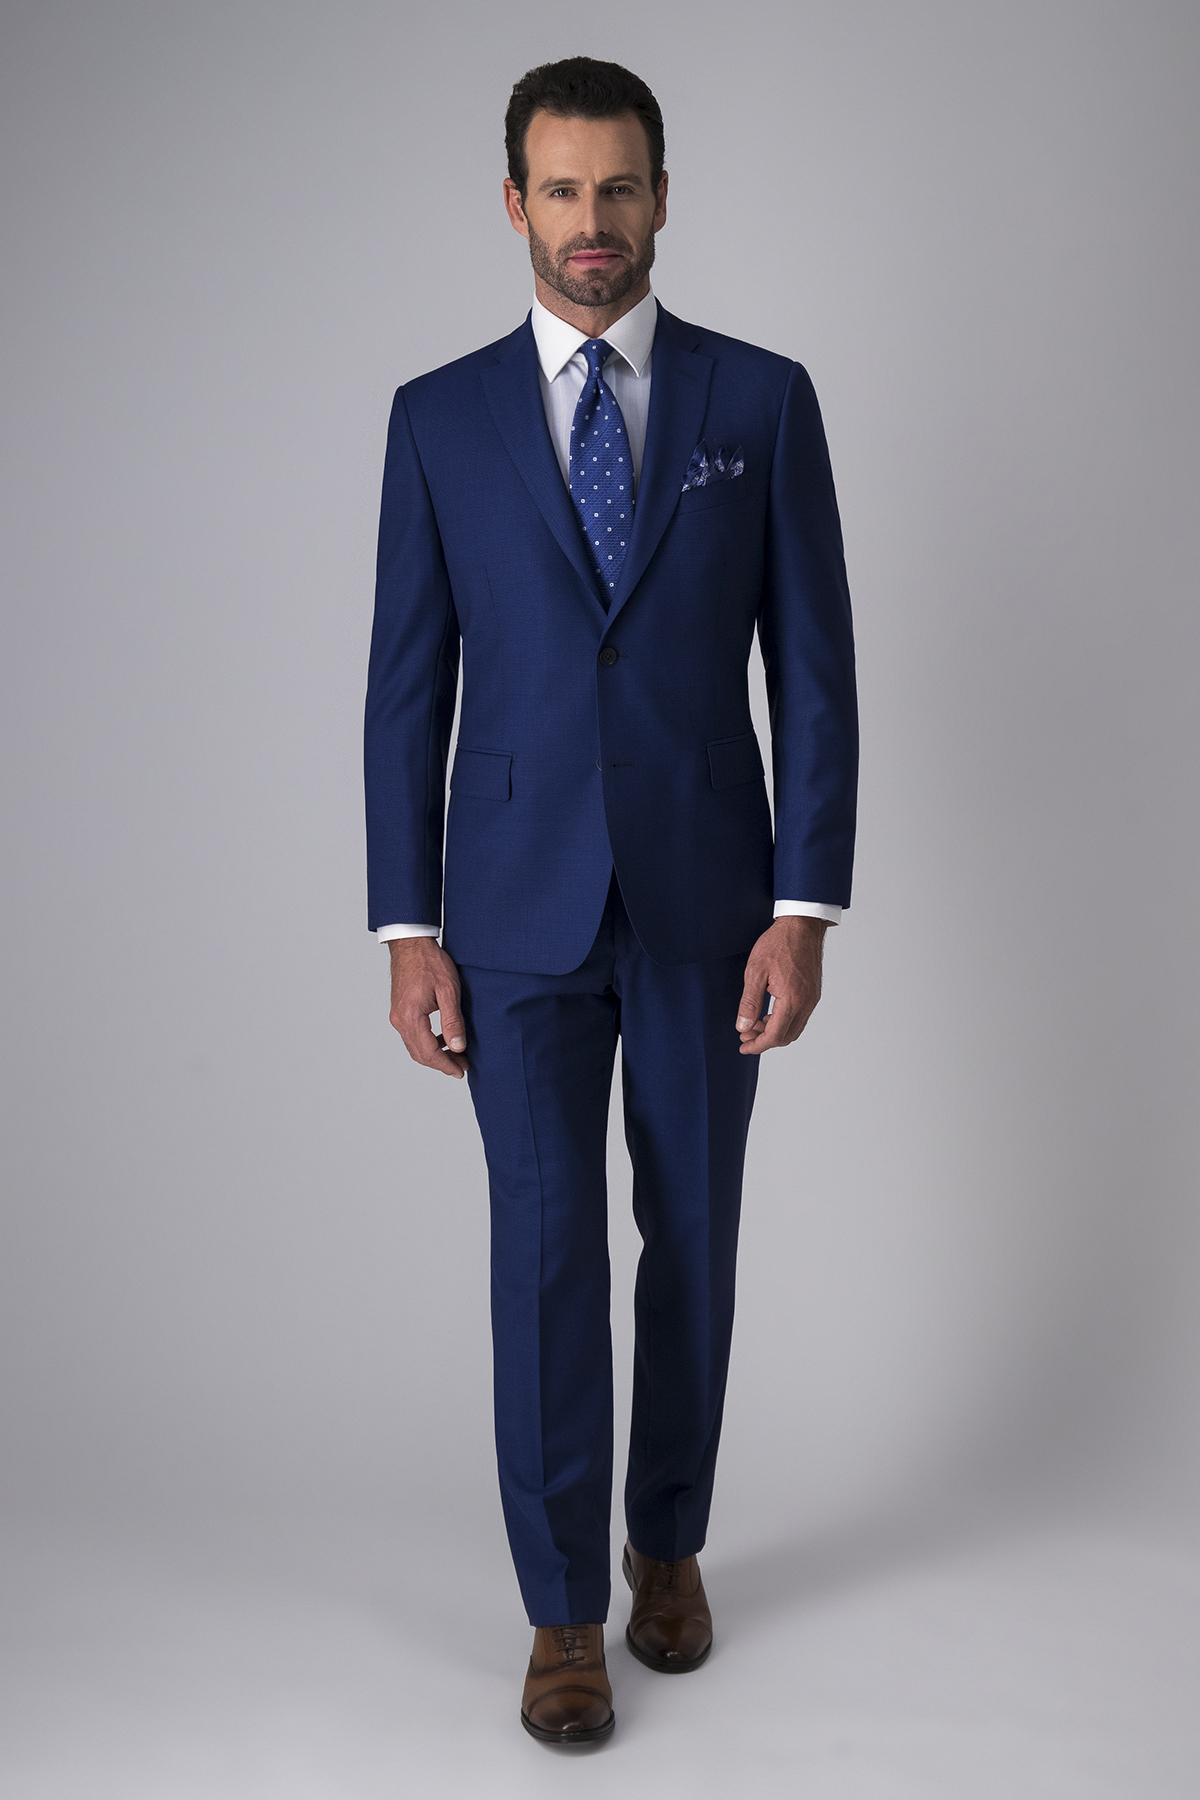 Traje Calderoni, tela italiana, fit contemporáneo, color azul.